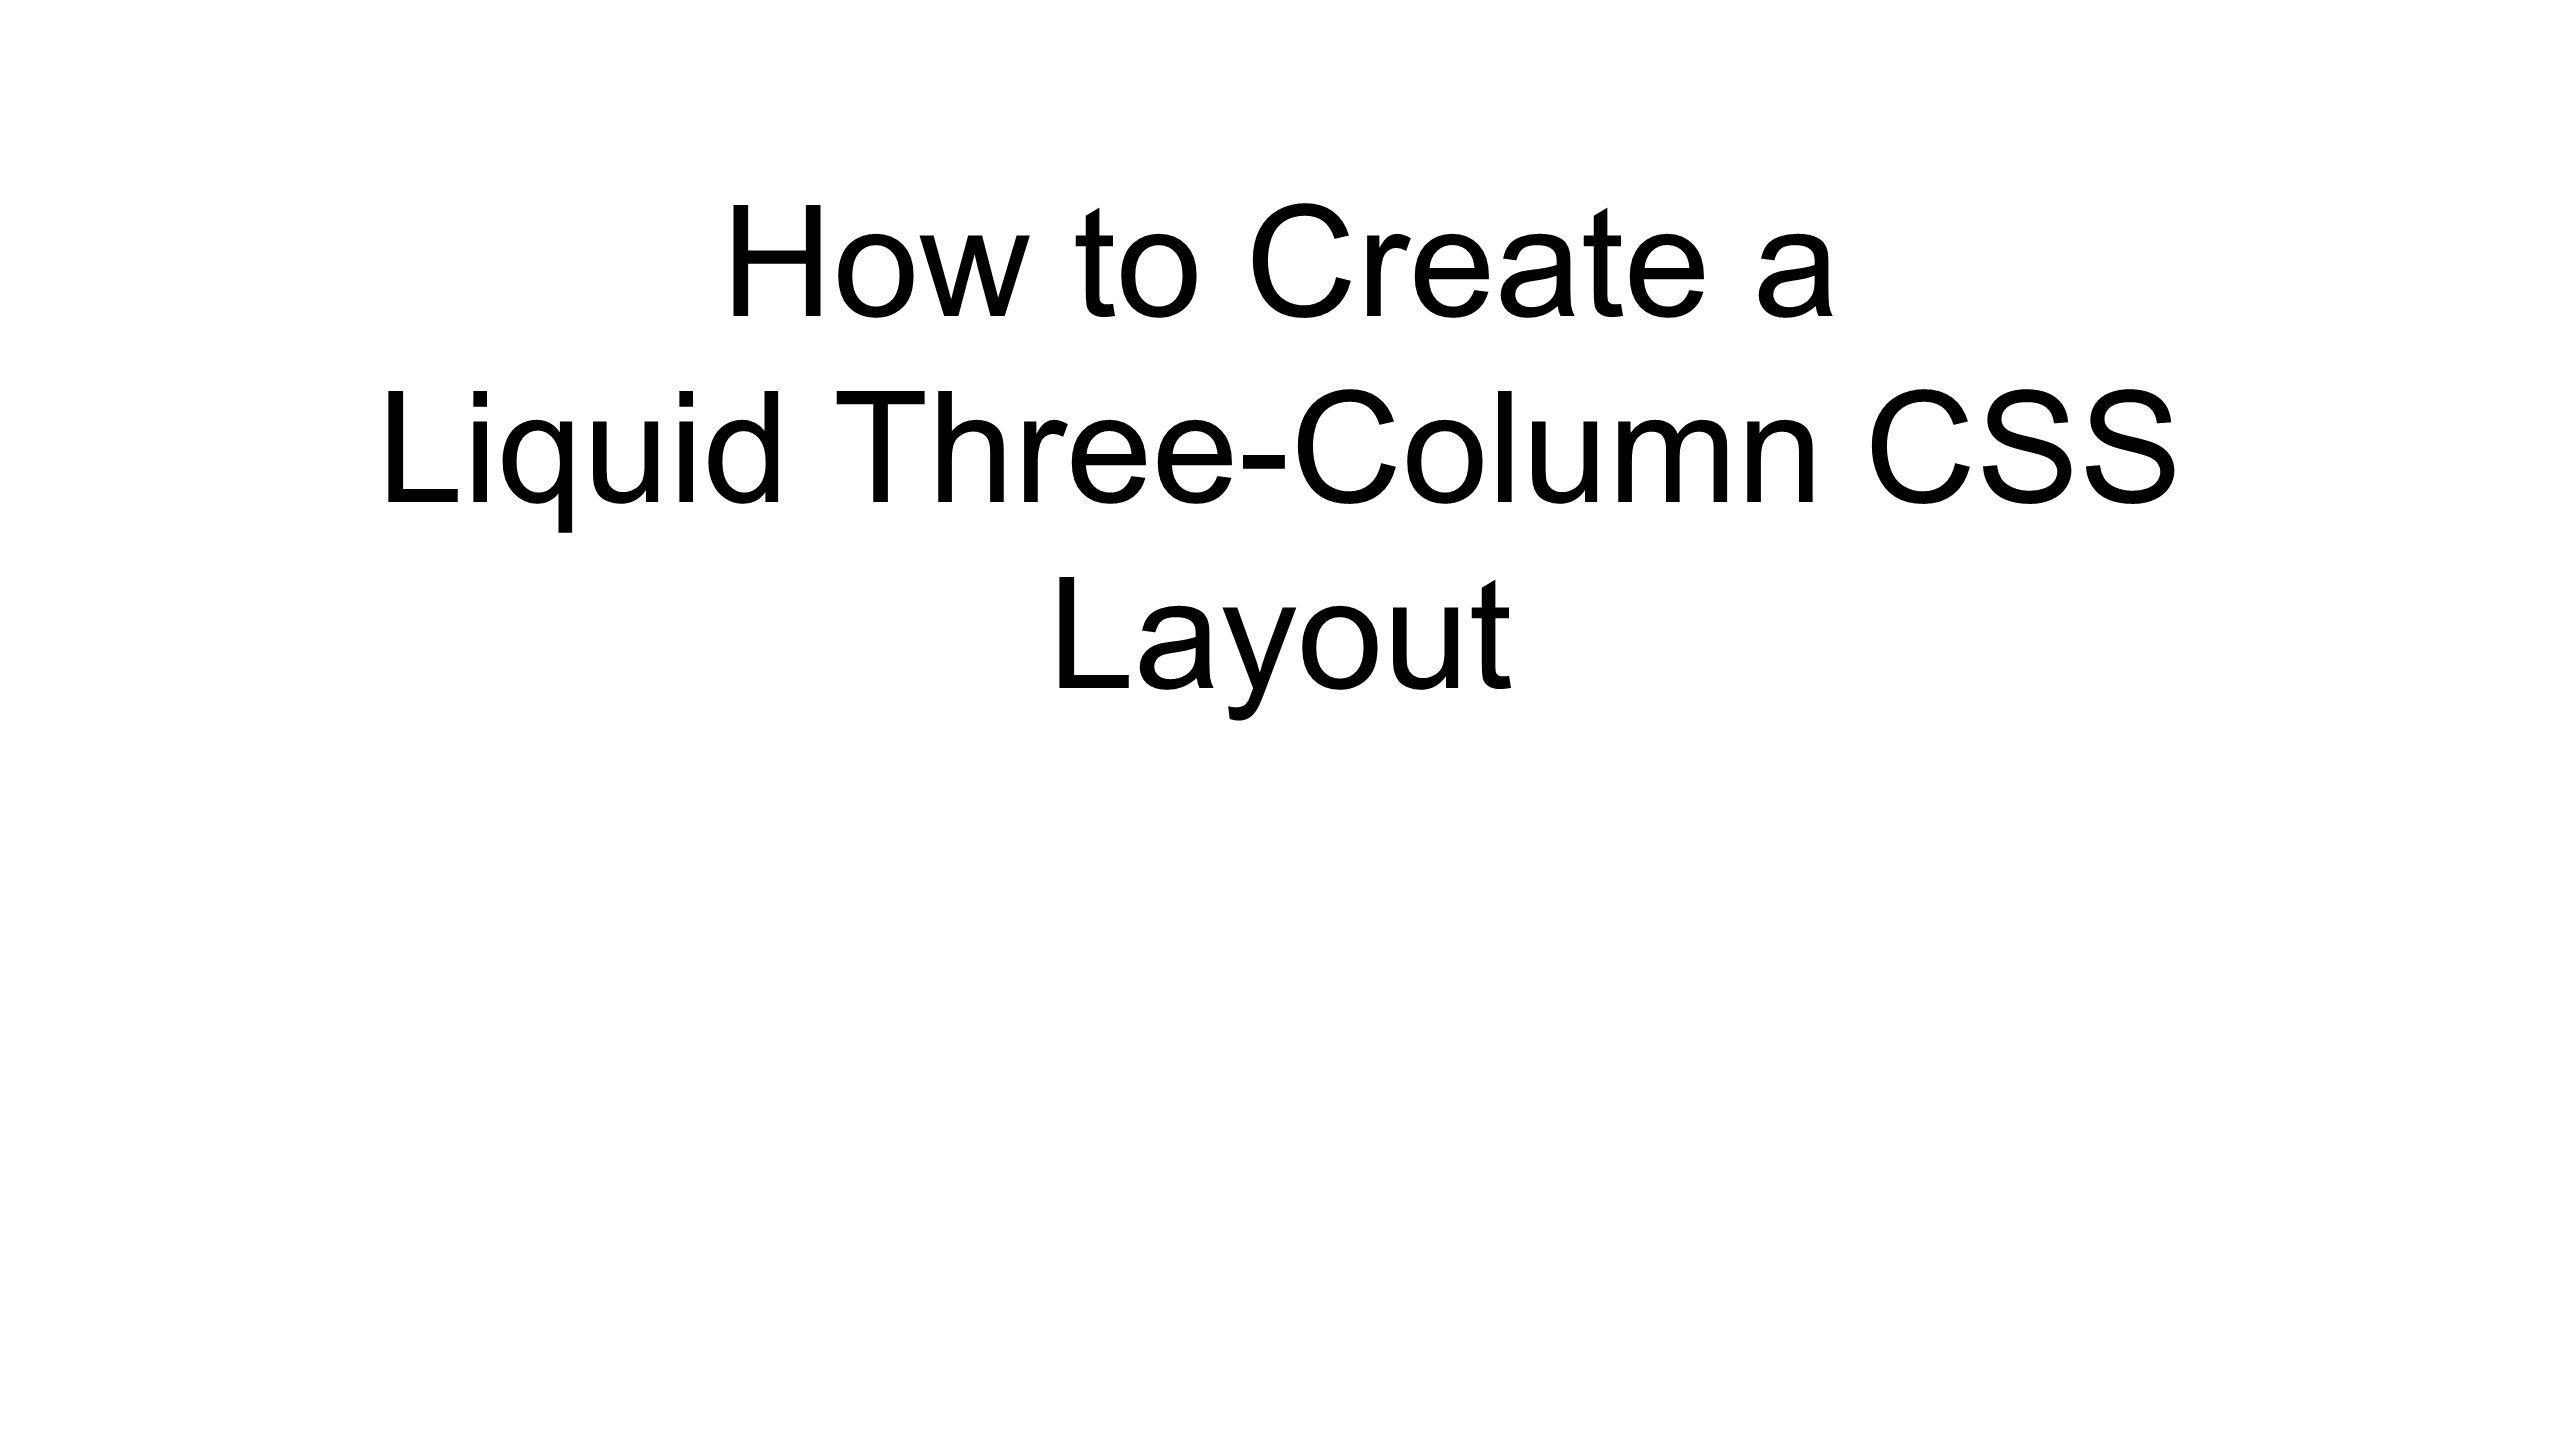 How to Create a Liquid Three-Column CSS Layout